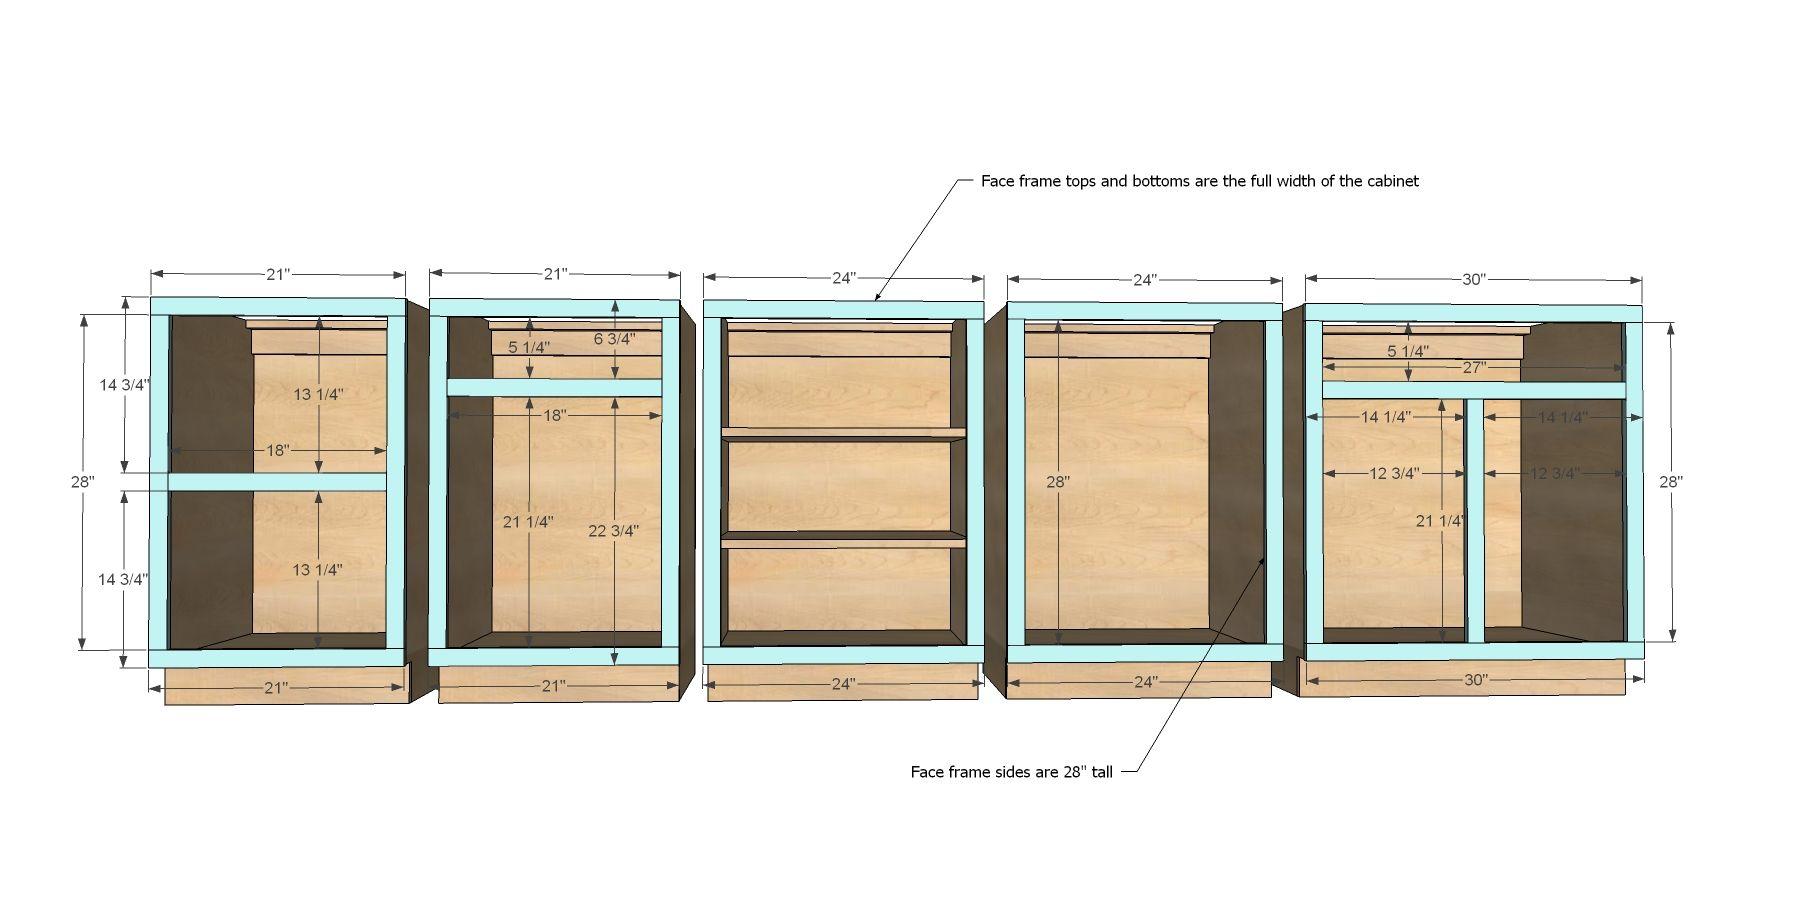 Ana White  Build a Face Frame Base Kitchen Cabinet